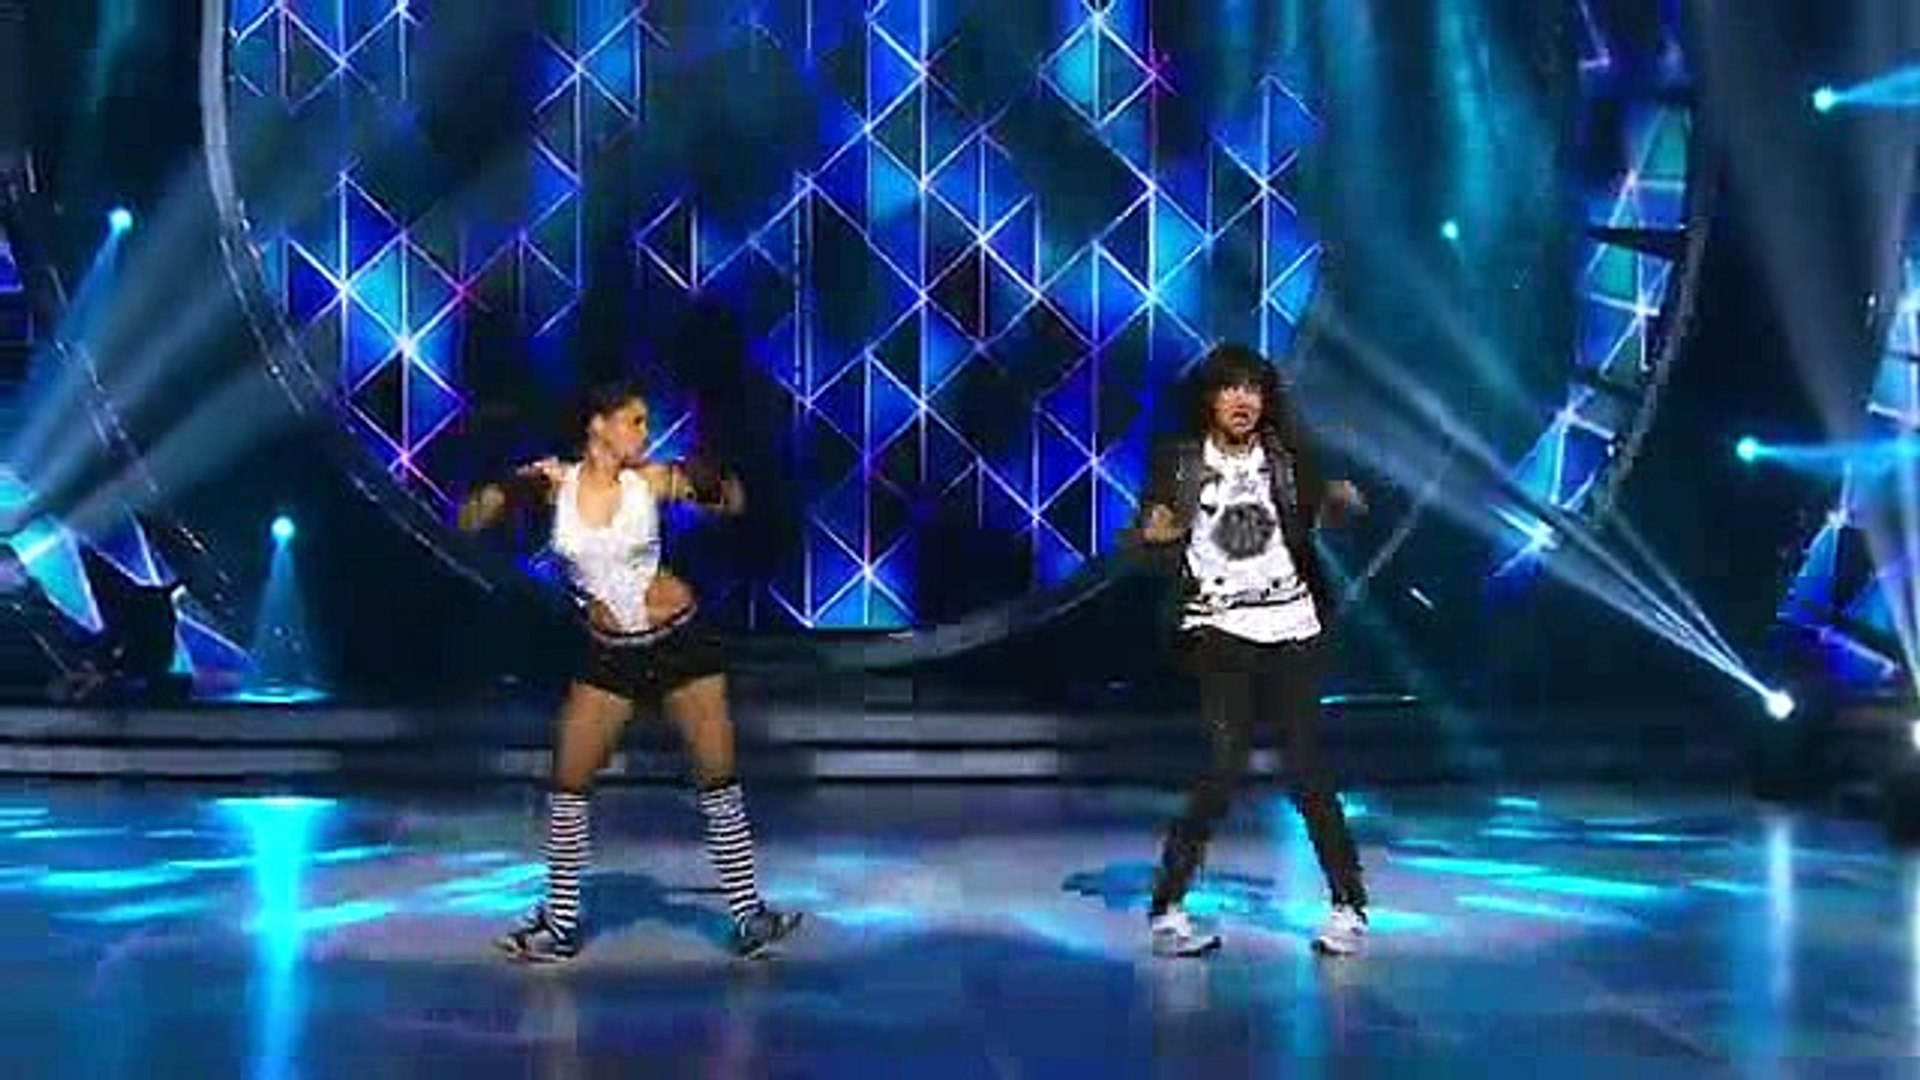 Bollywood Hip-Hop Amazing Dance on song Befikra    Shanatanu Maheshwari    Alisha Singh    Jhalak Di